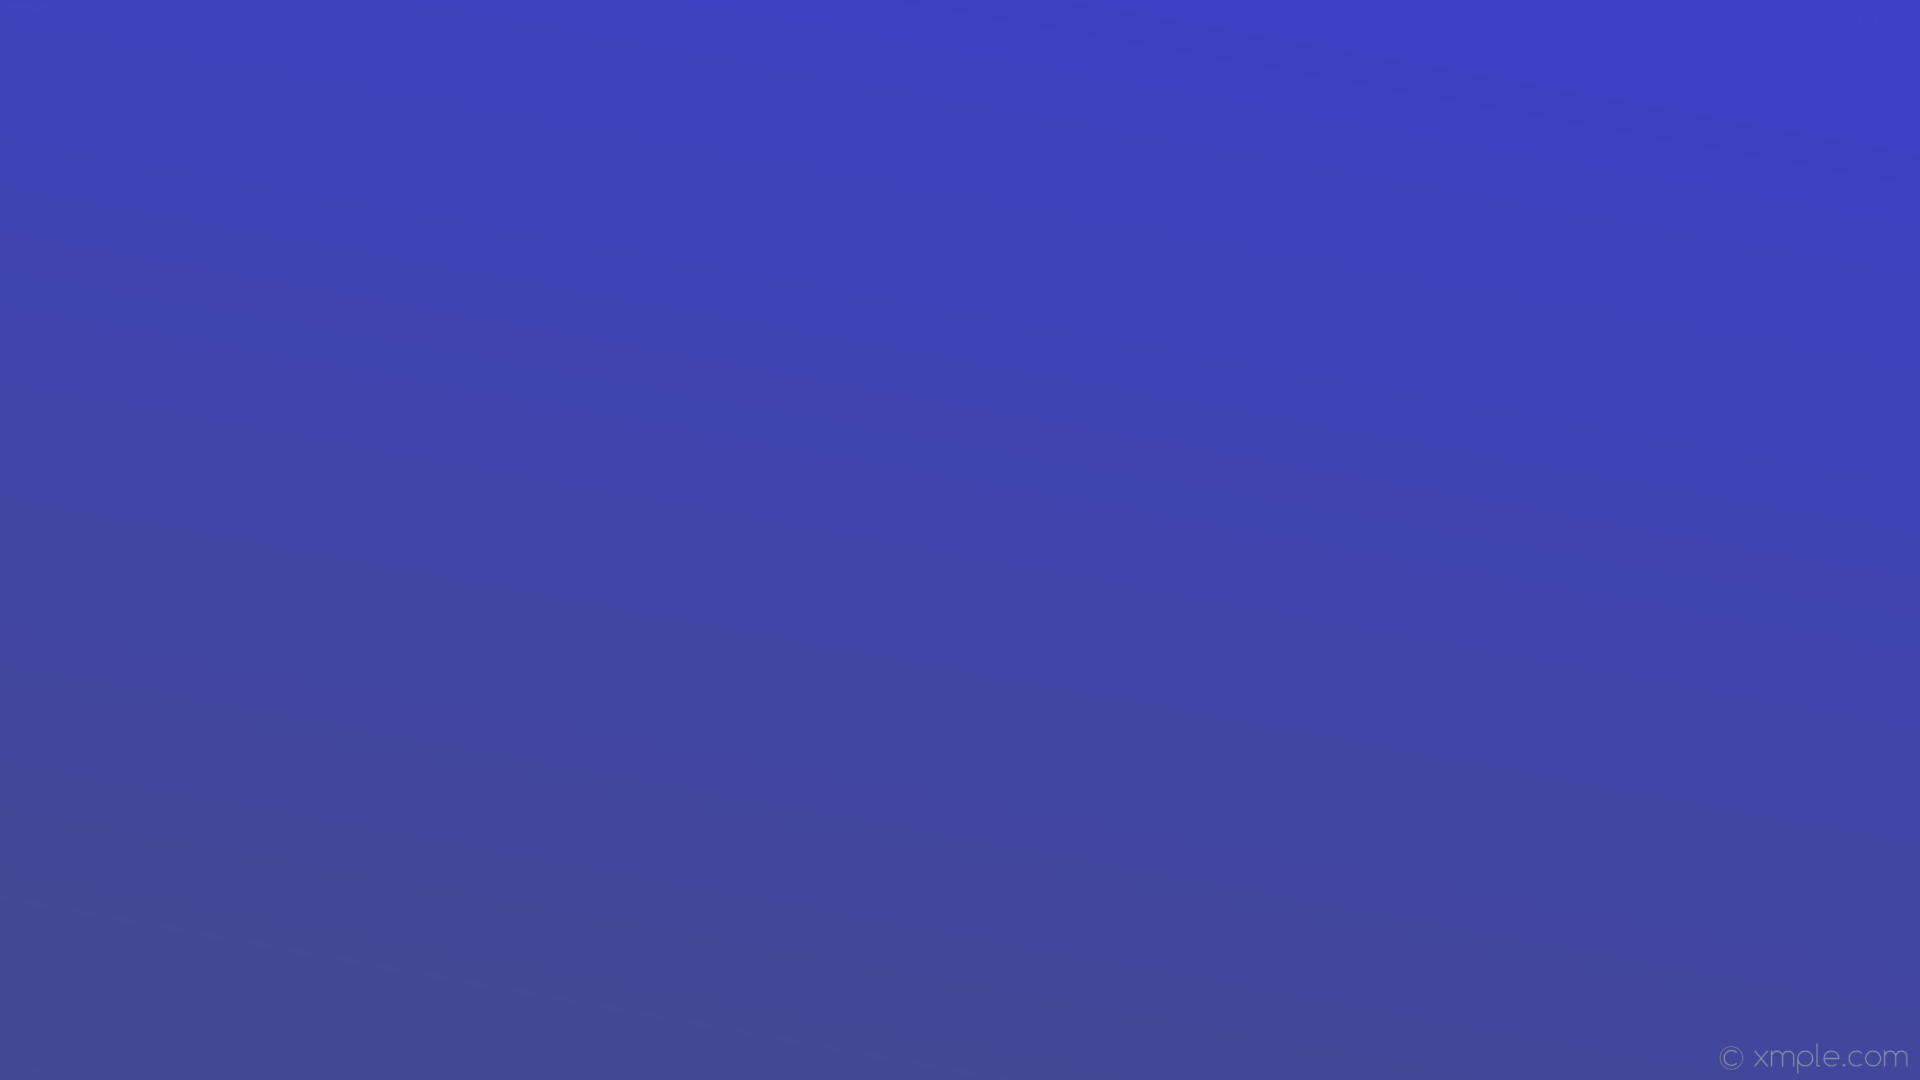 wallpaper linear blue gradient #3b42c4 #444892 60°